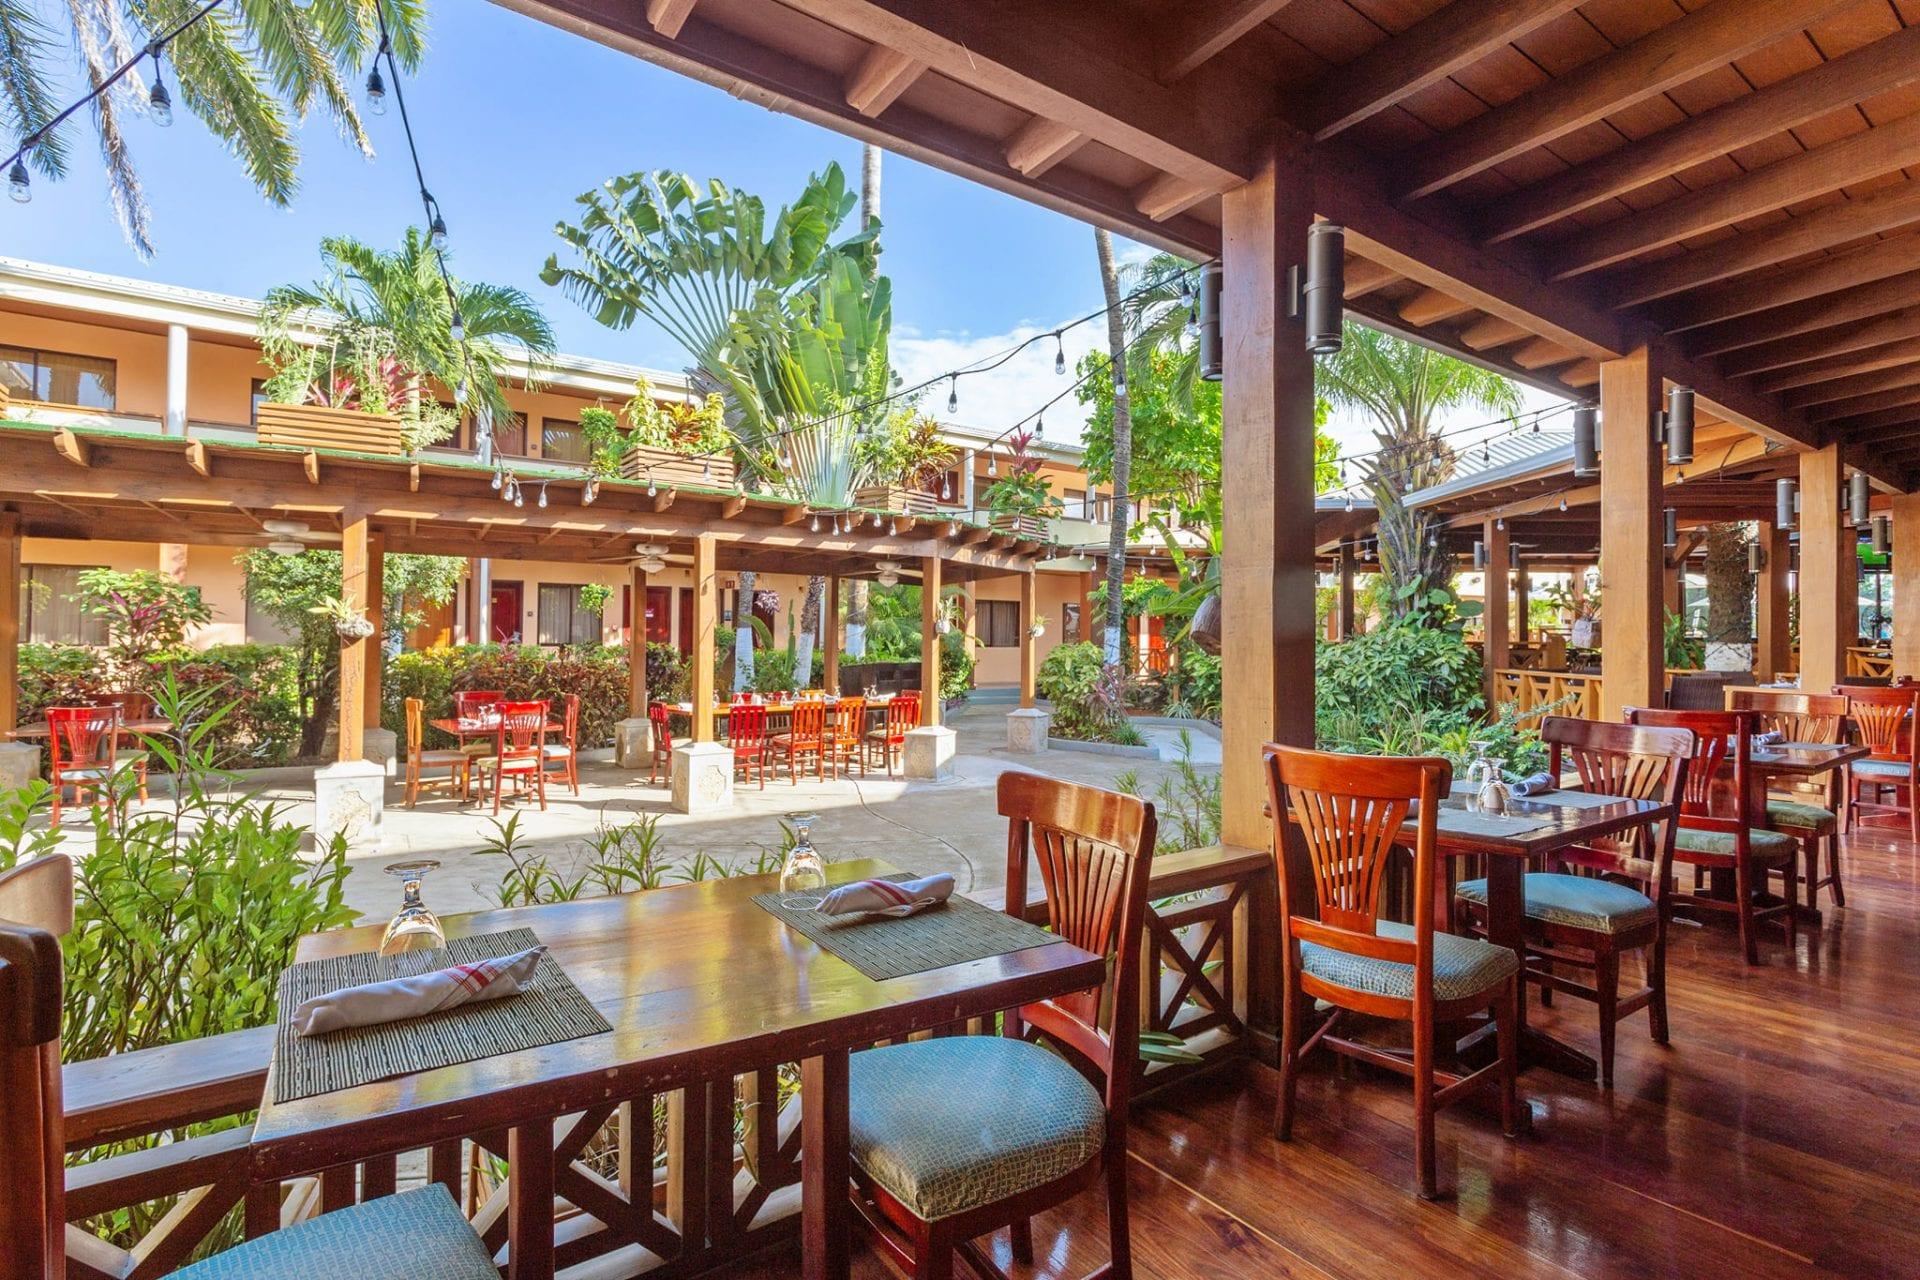 biltmore al fresco dining Belize City